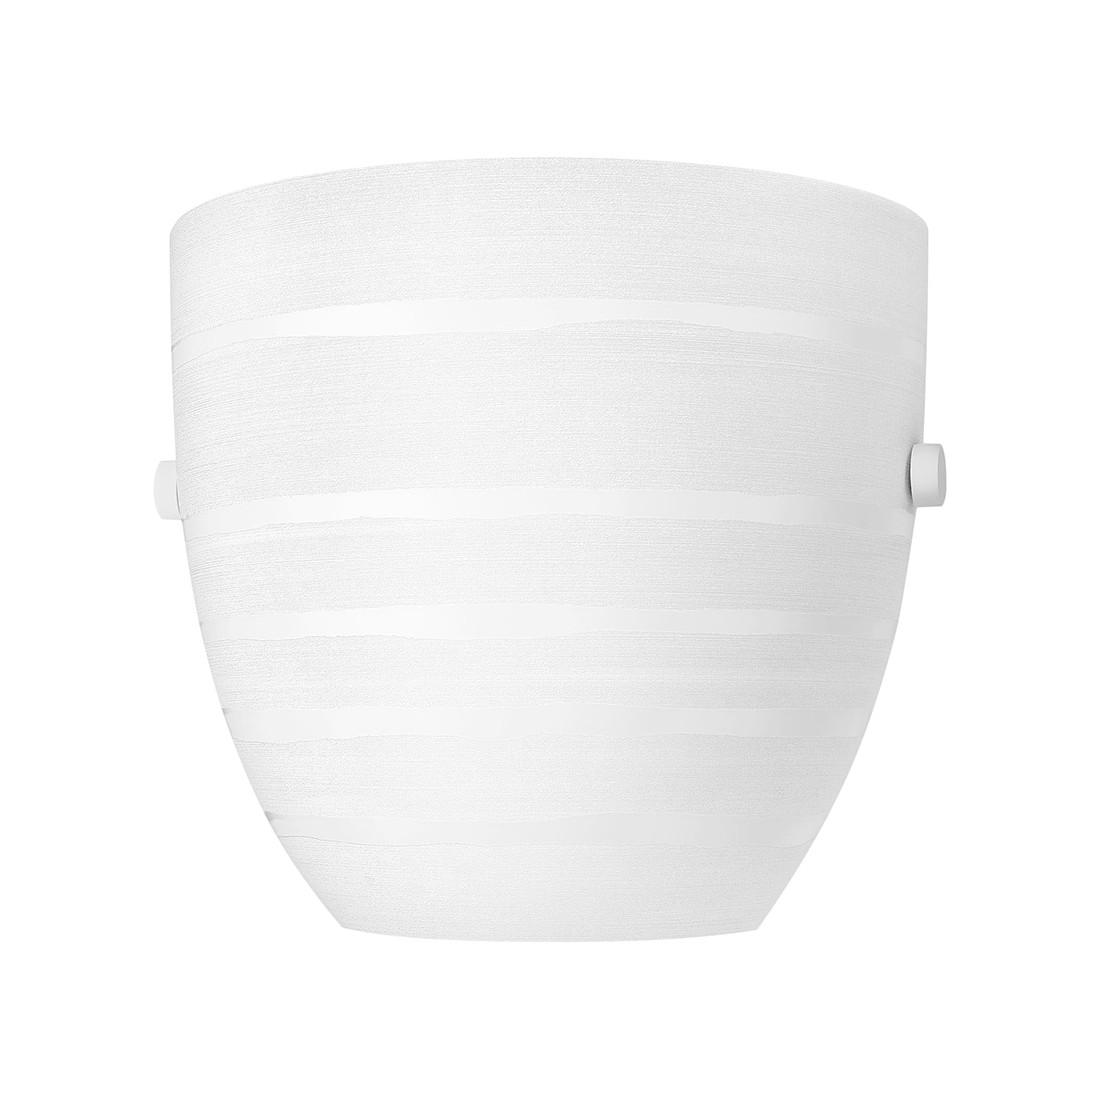 LED-Wandleuchte myLiving Oval I ● Weiß ● 1-flammig- Philips A+